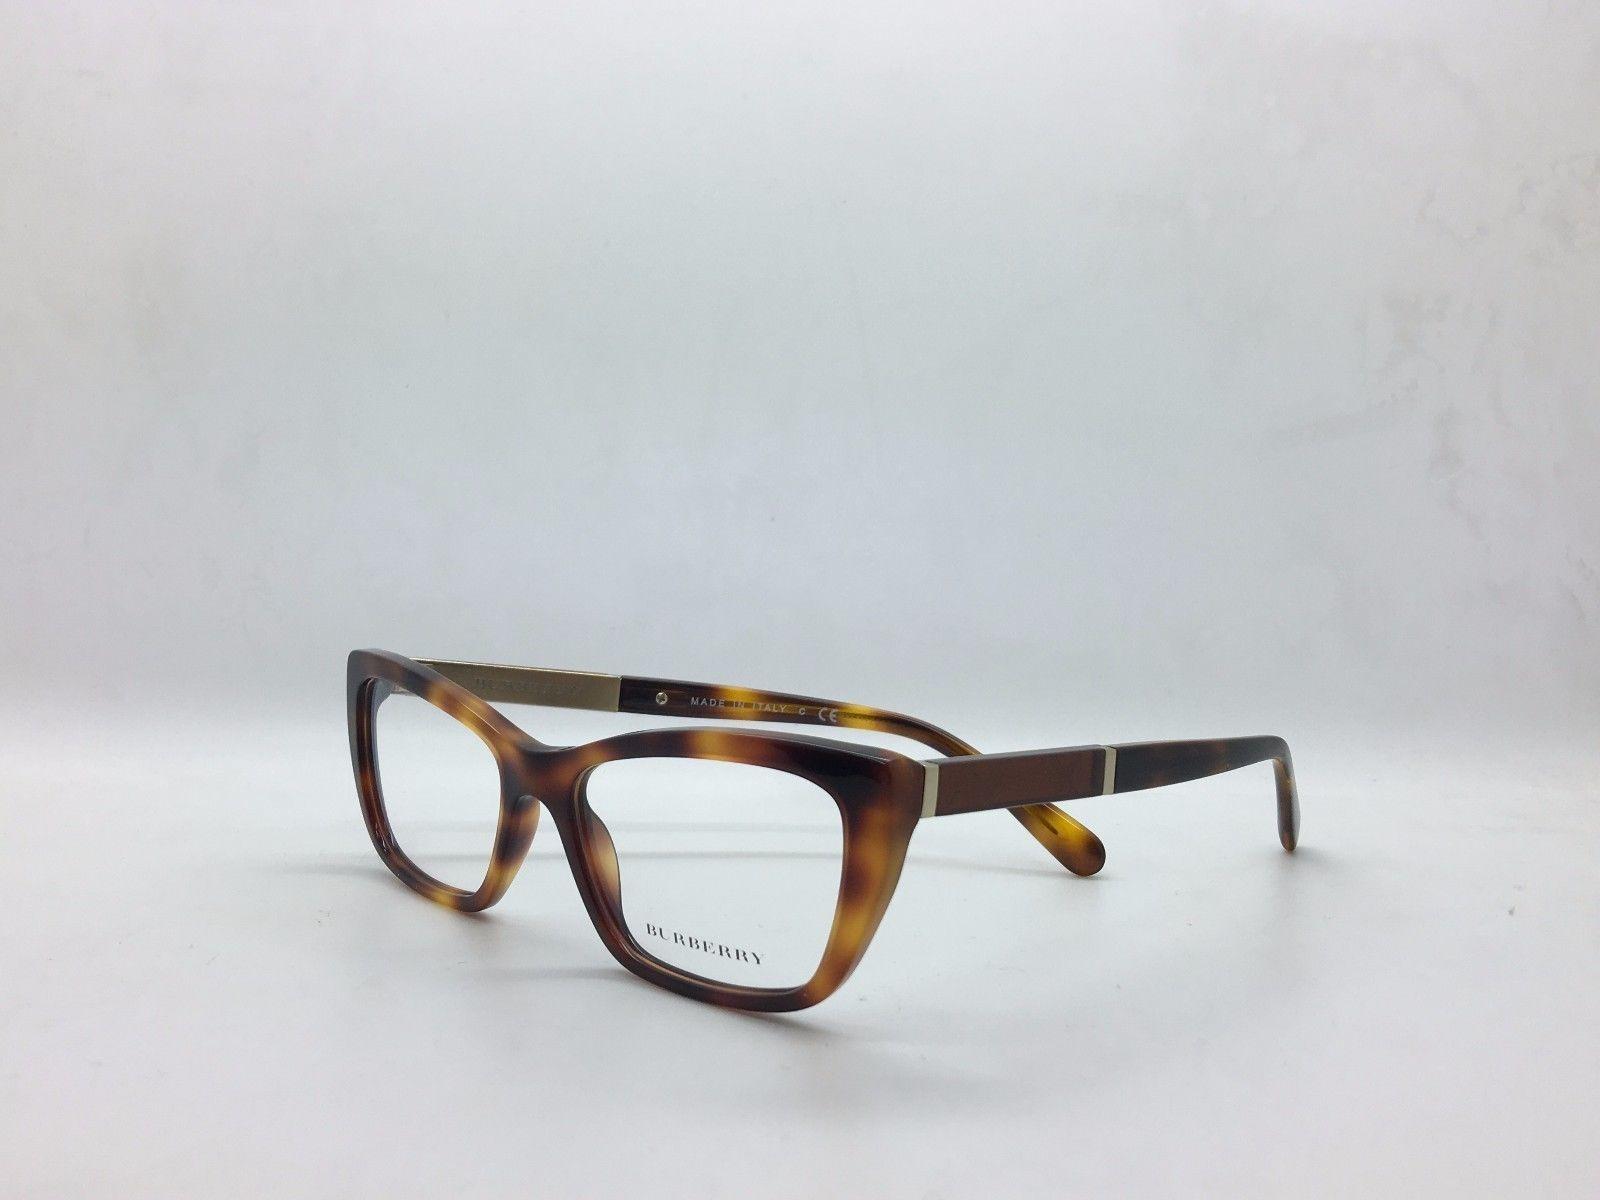 fc0c2ec35a8 Burberry BE B 2236 3316 Light Havana Plastic Cat Eye Eyeglasses women 52mm